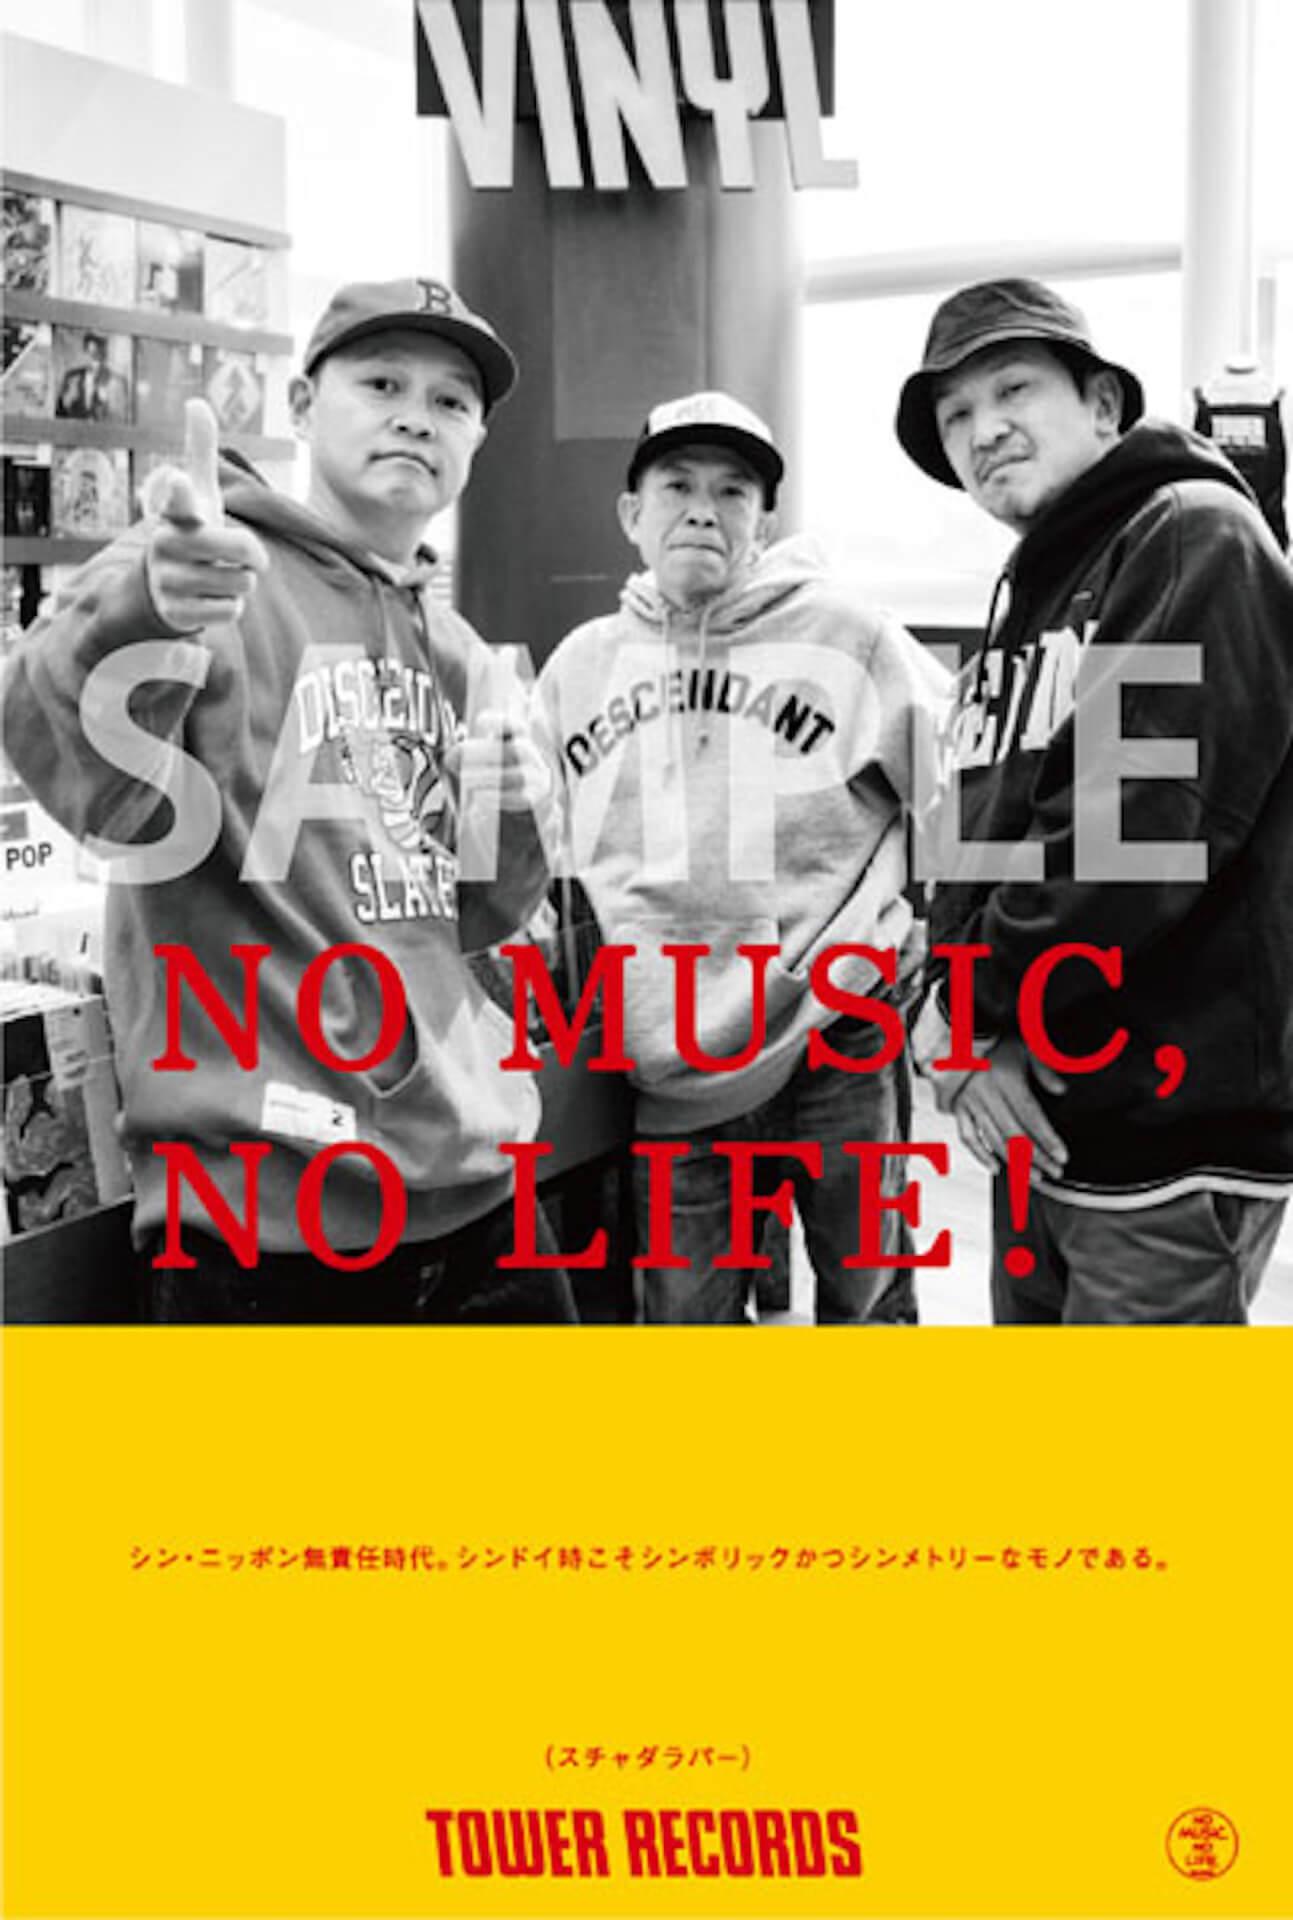 「NO MUSIC,NO LIFE.」ポスターに日本語ラップレジェンドのスチャダラパー×ライムスター、Zeebra×SOUL SCREAMが登場! music200406_nomusicnolife_09